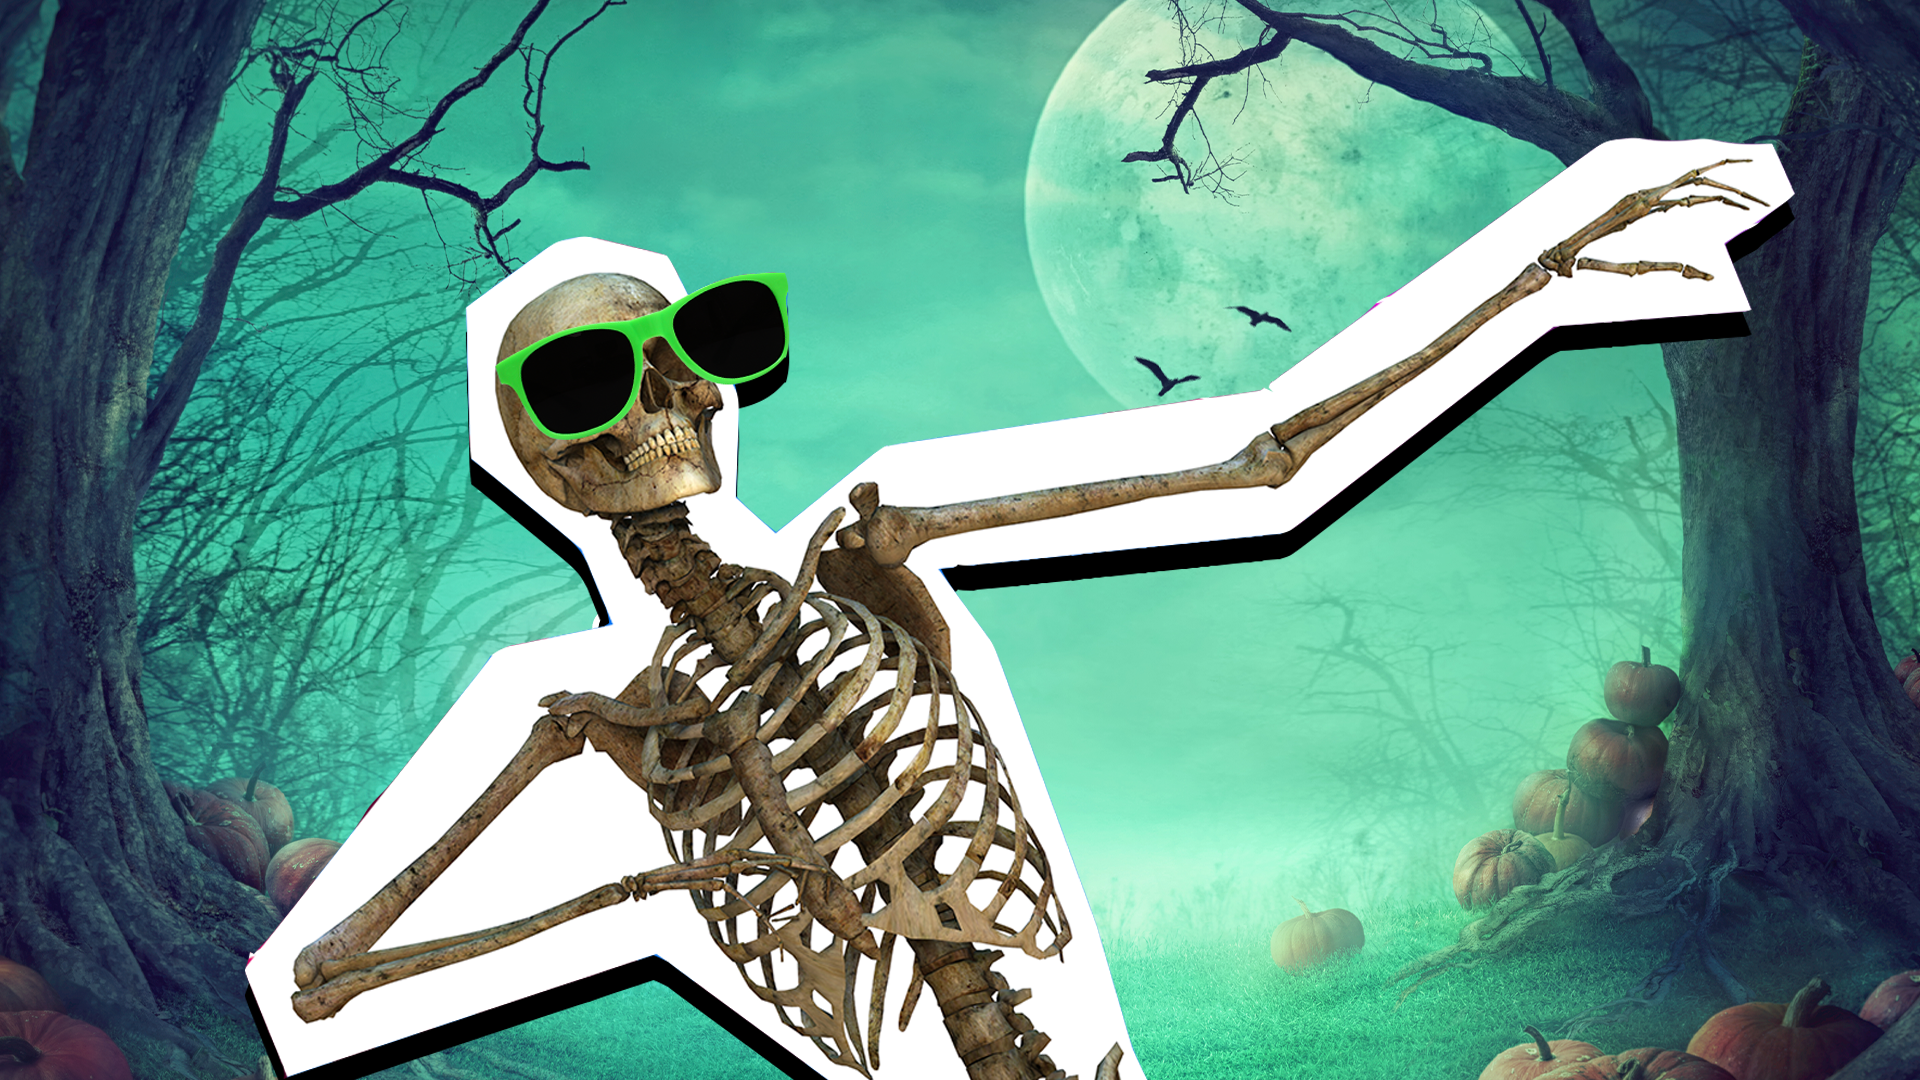 Grinning skeleton wearing green sunglasses doing the Dap Fornite dance